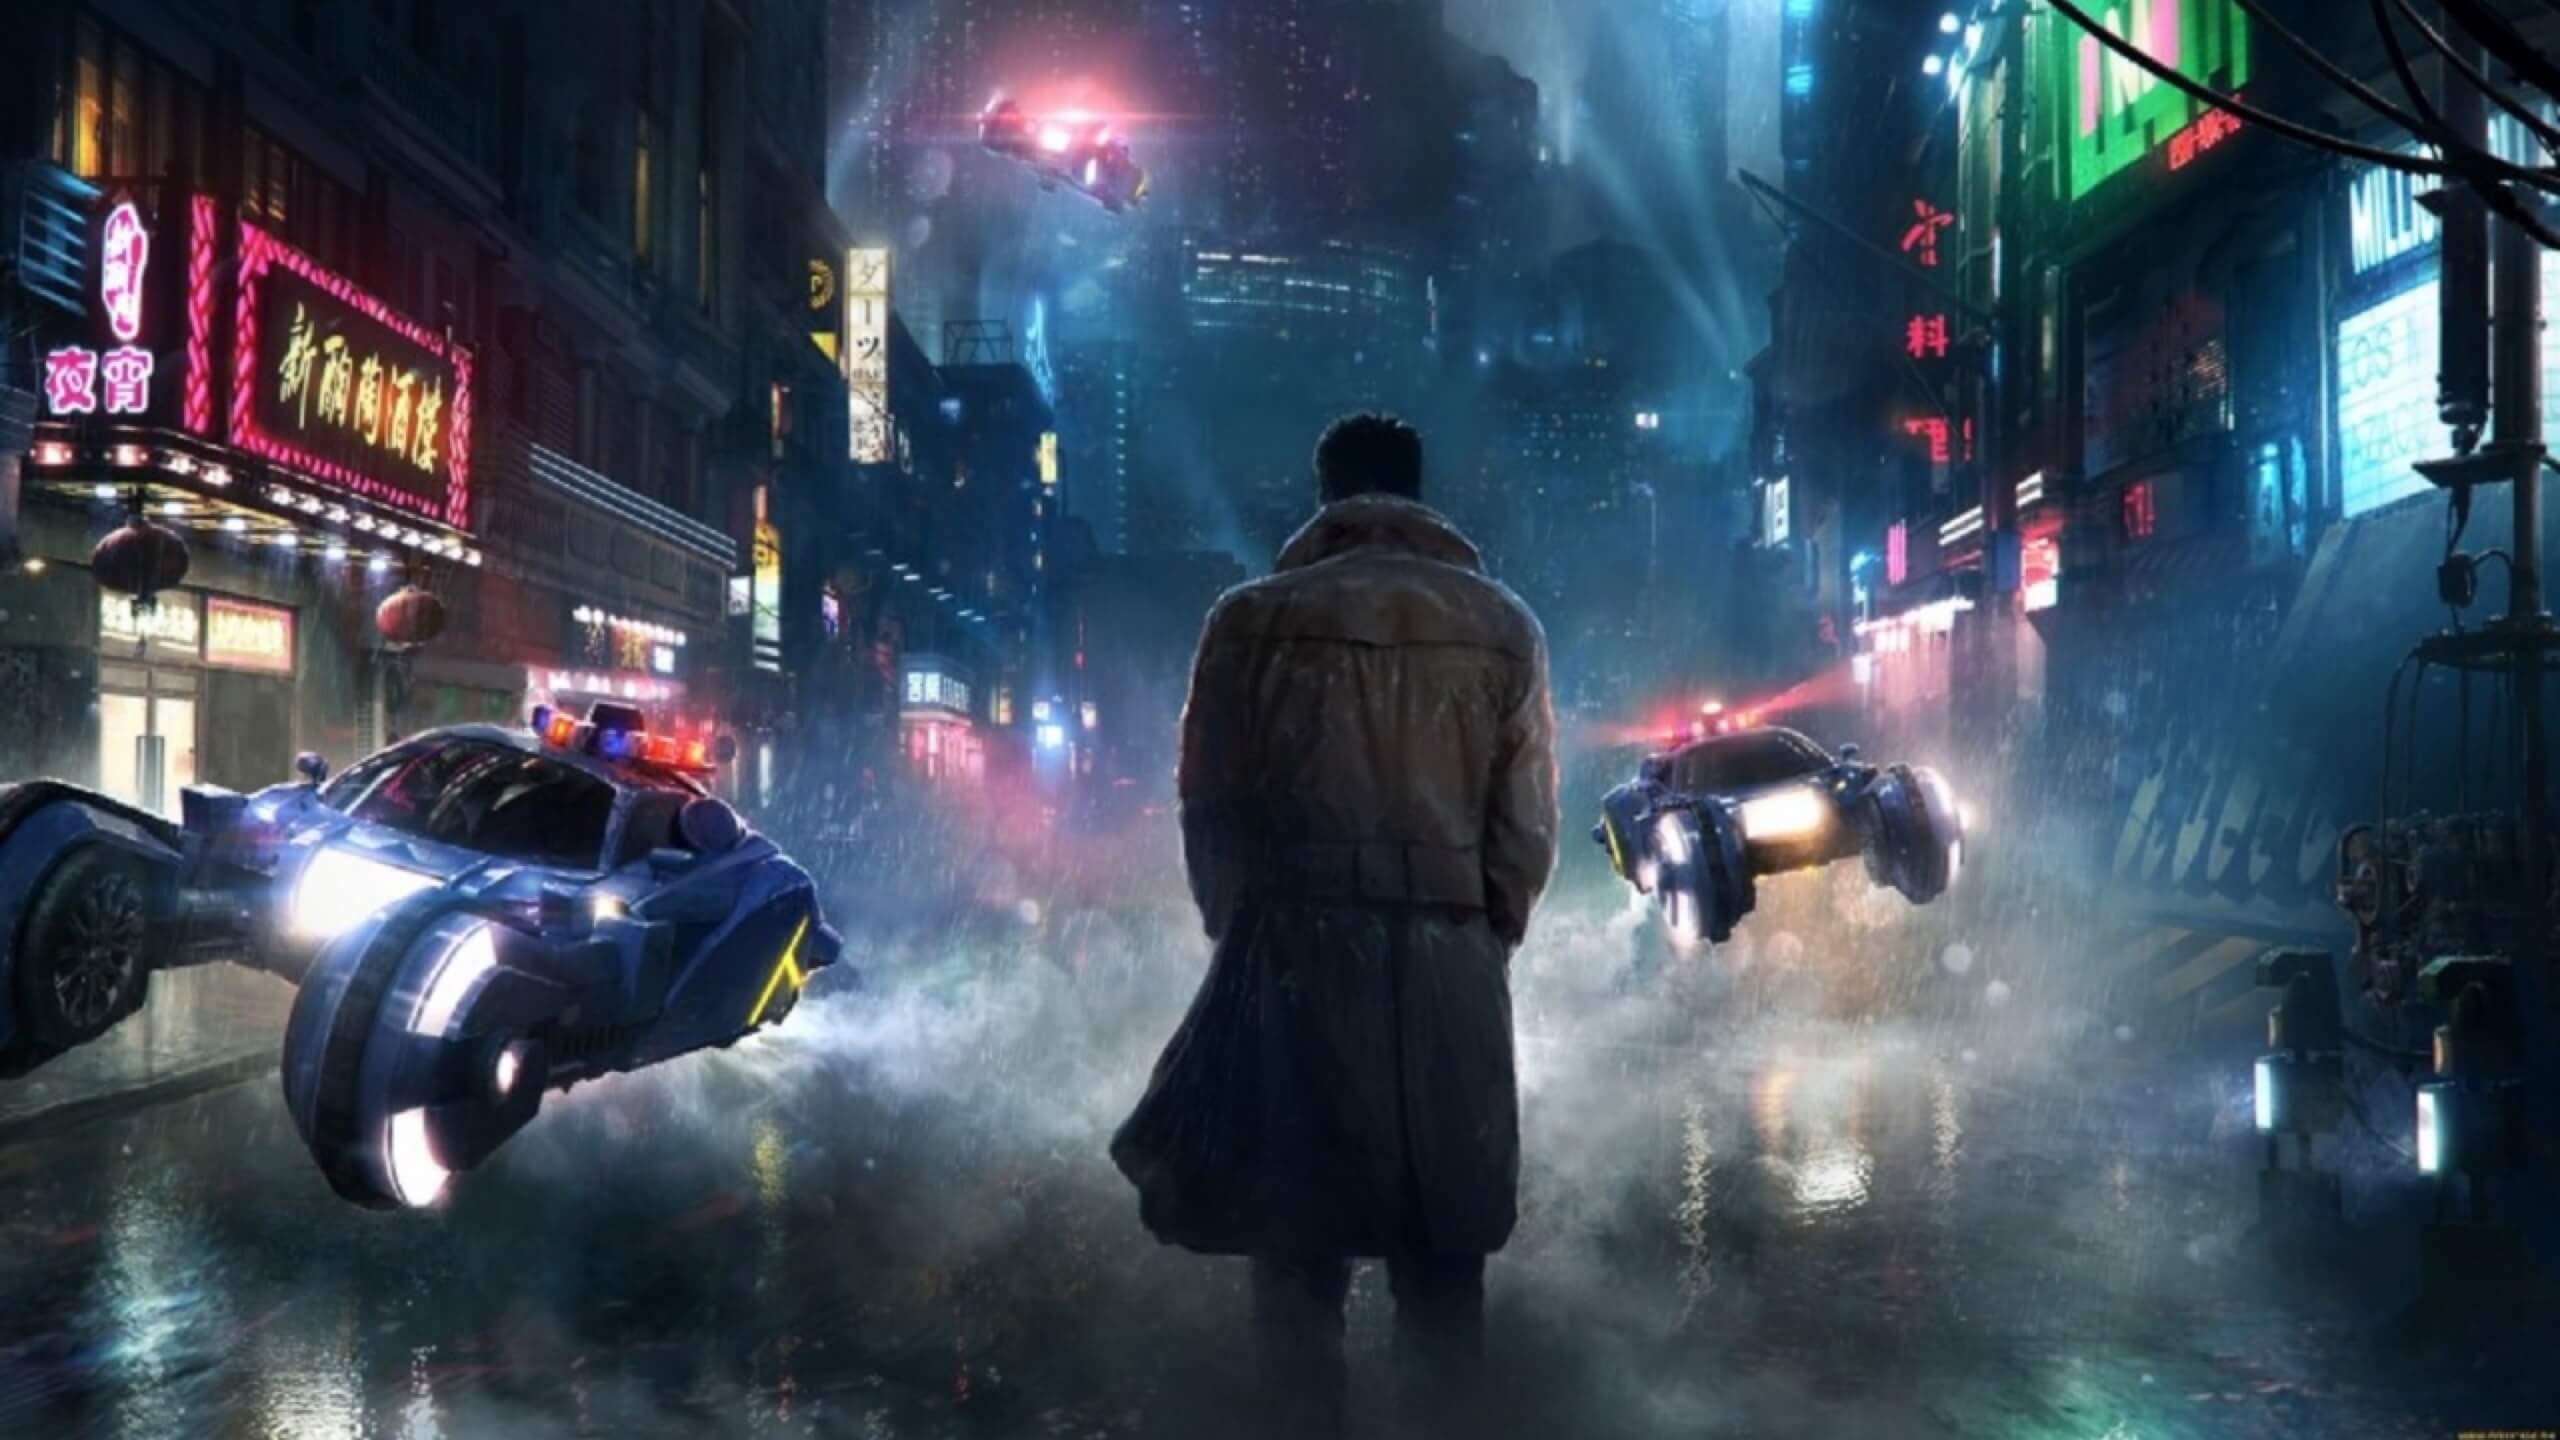 Futuristic 'Blade Runner 2049' Trailer Debuts!